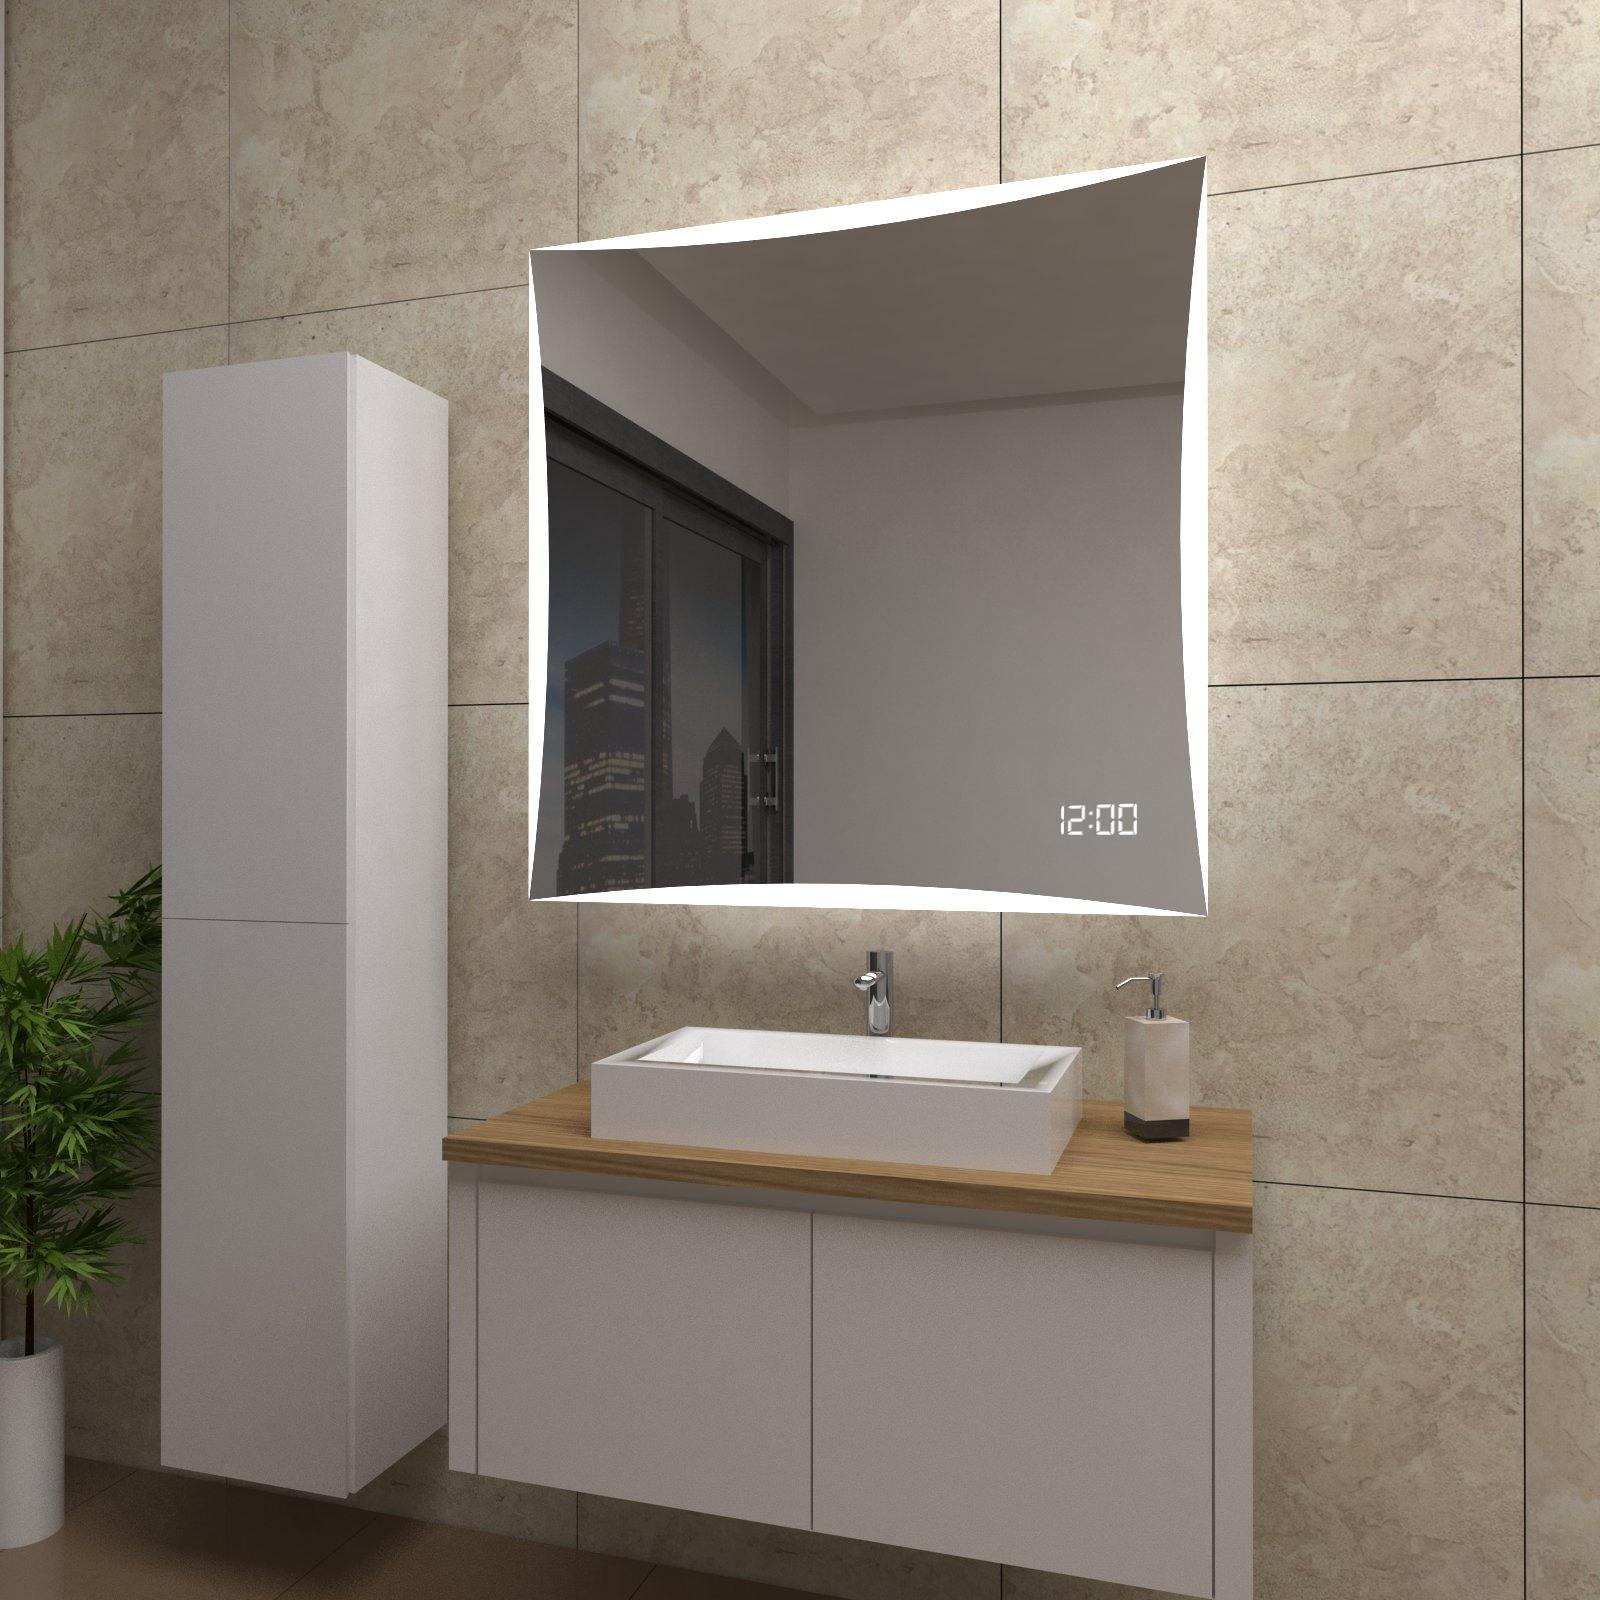 spiegel quinn mit led beleuchtung und uhr temprix markenspiegel. Black Bedroom Furniture Sets. Home Design Ideas